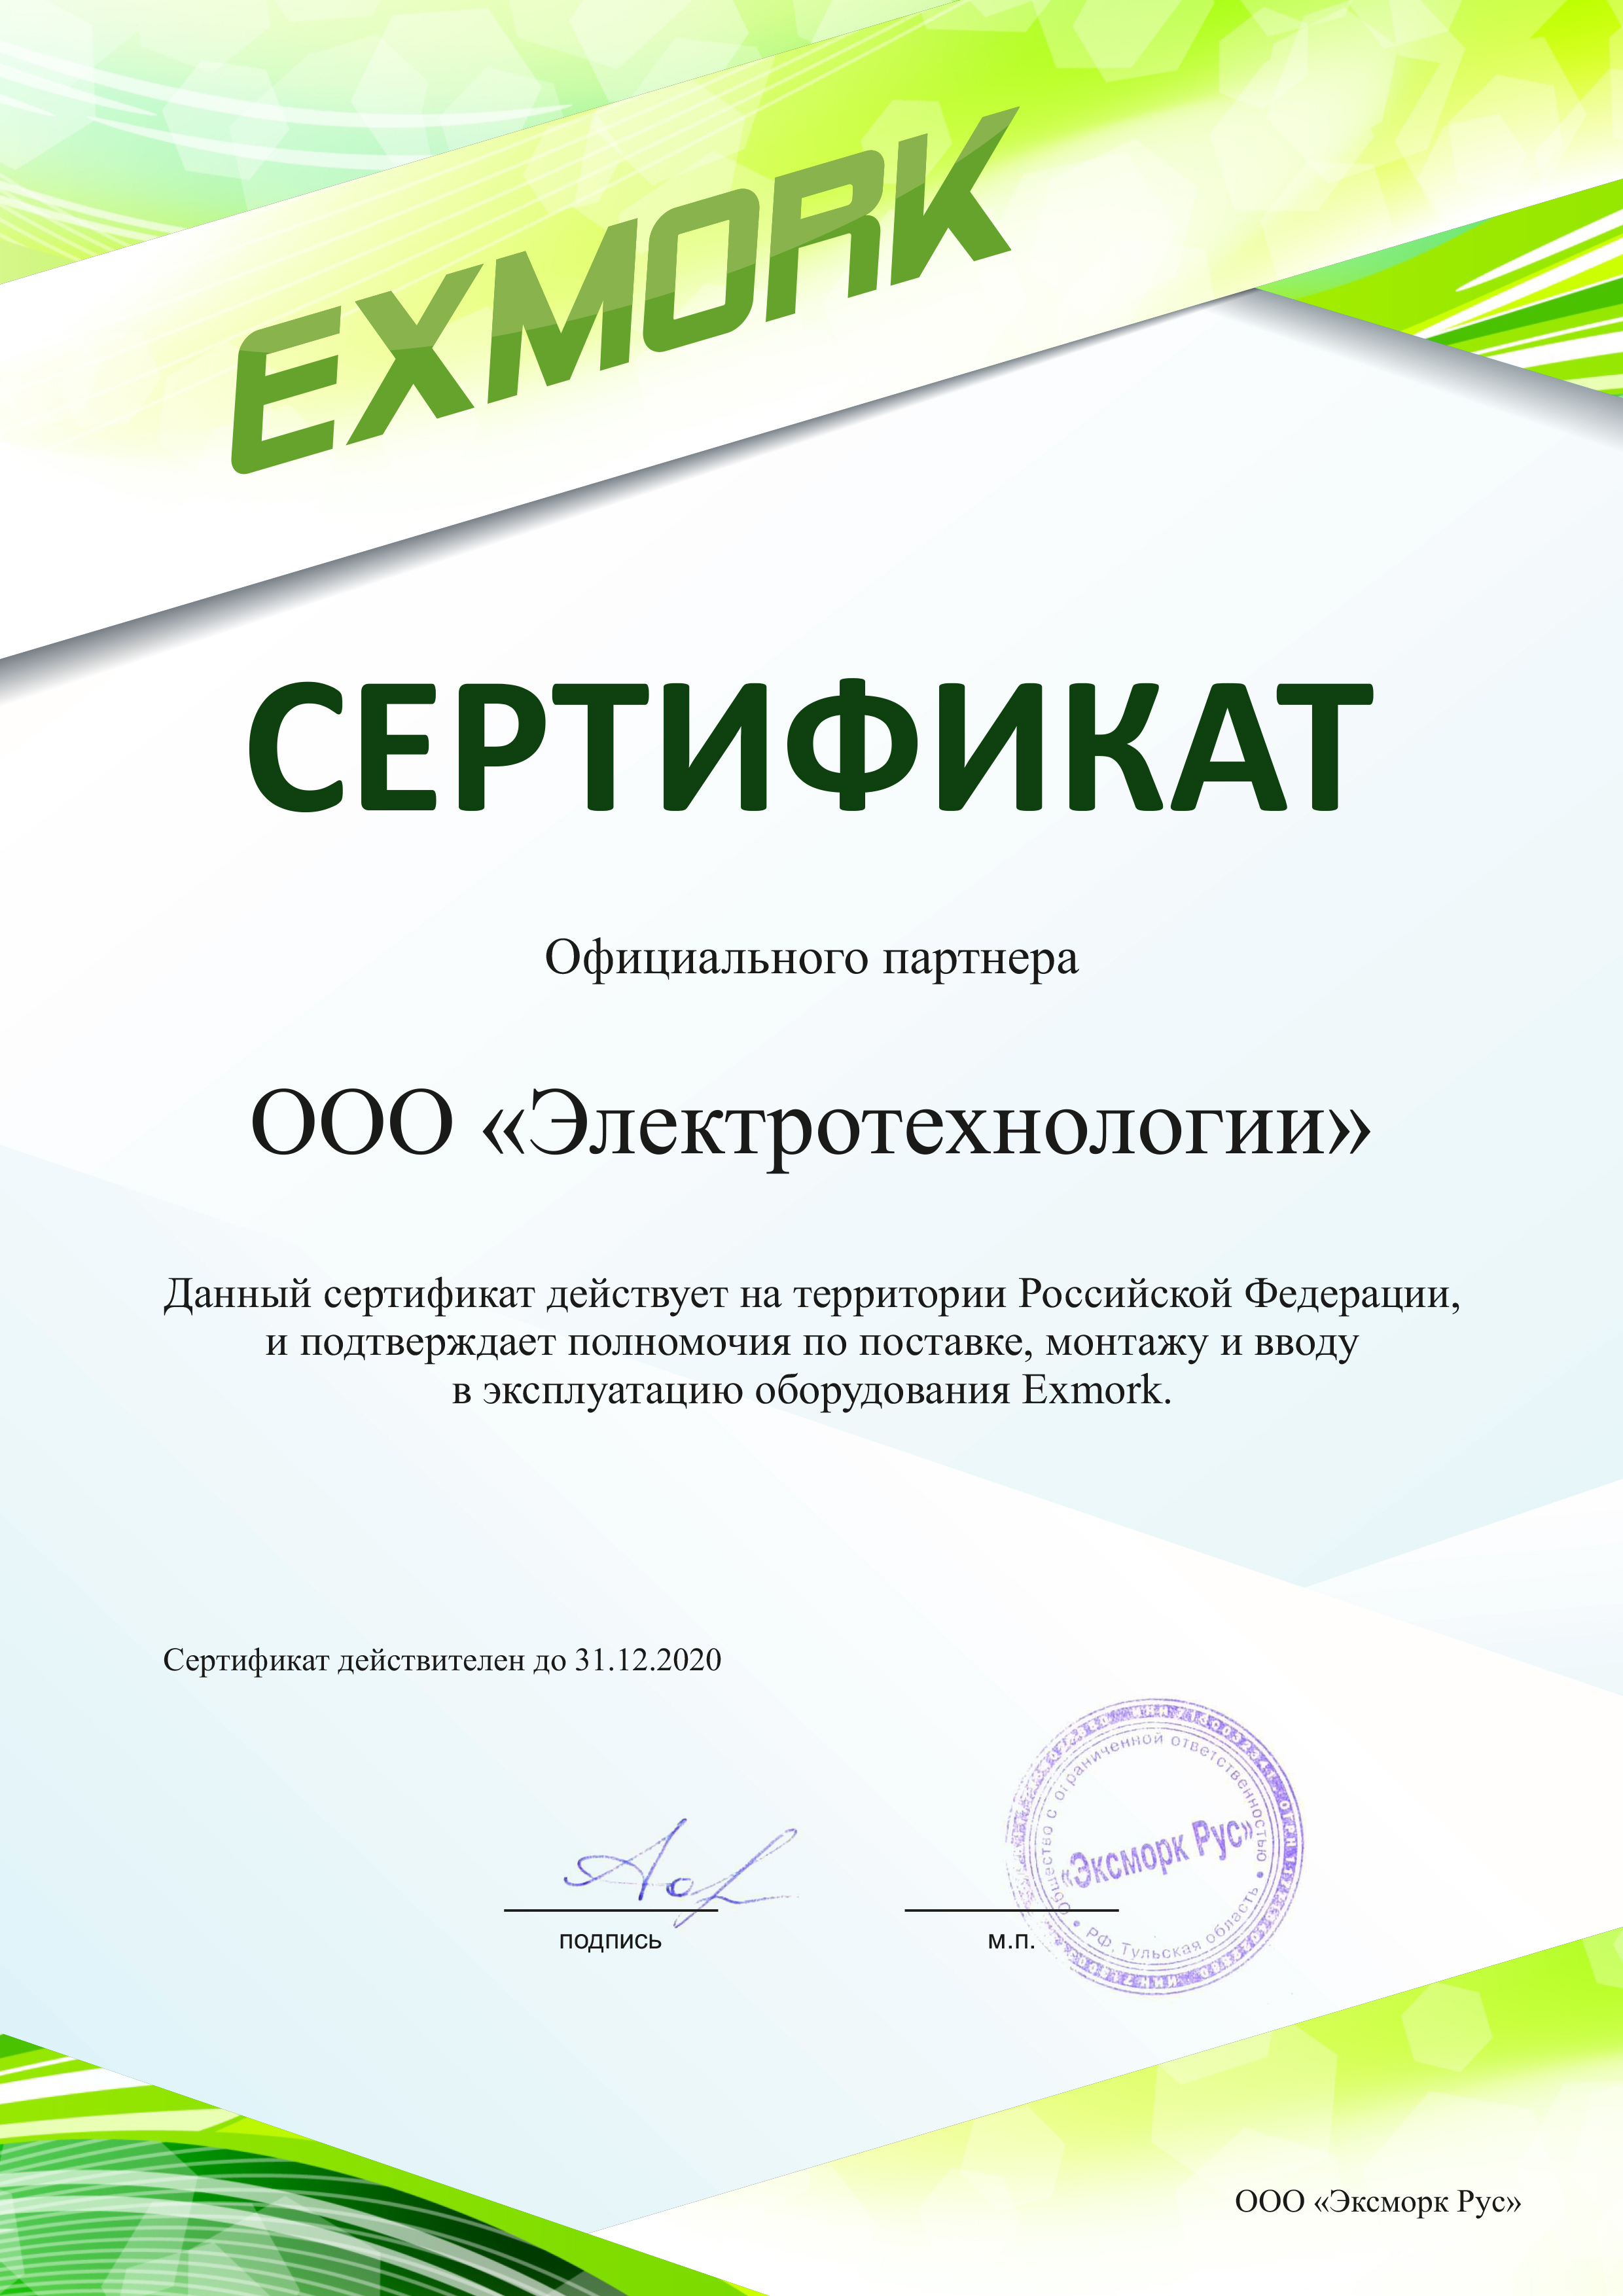 Сертификат Exmork ООО Электротехнологии